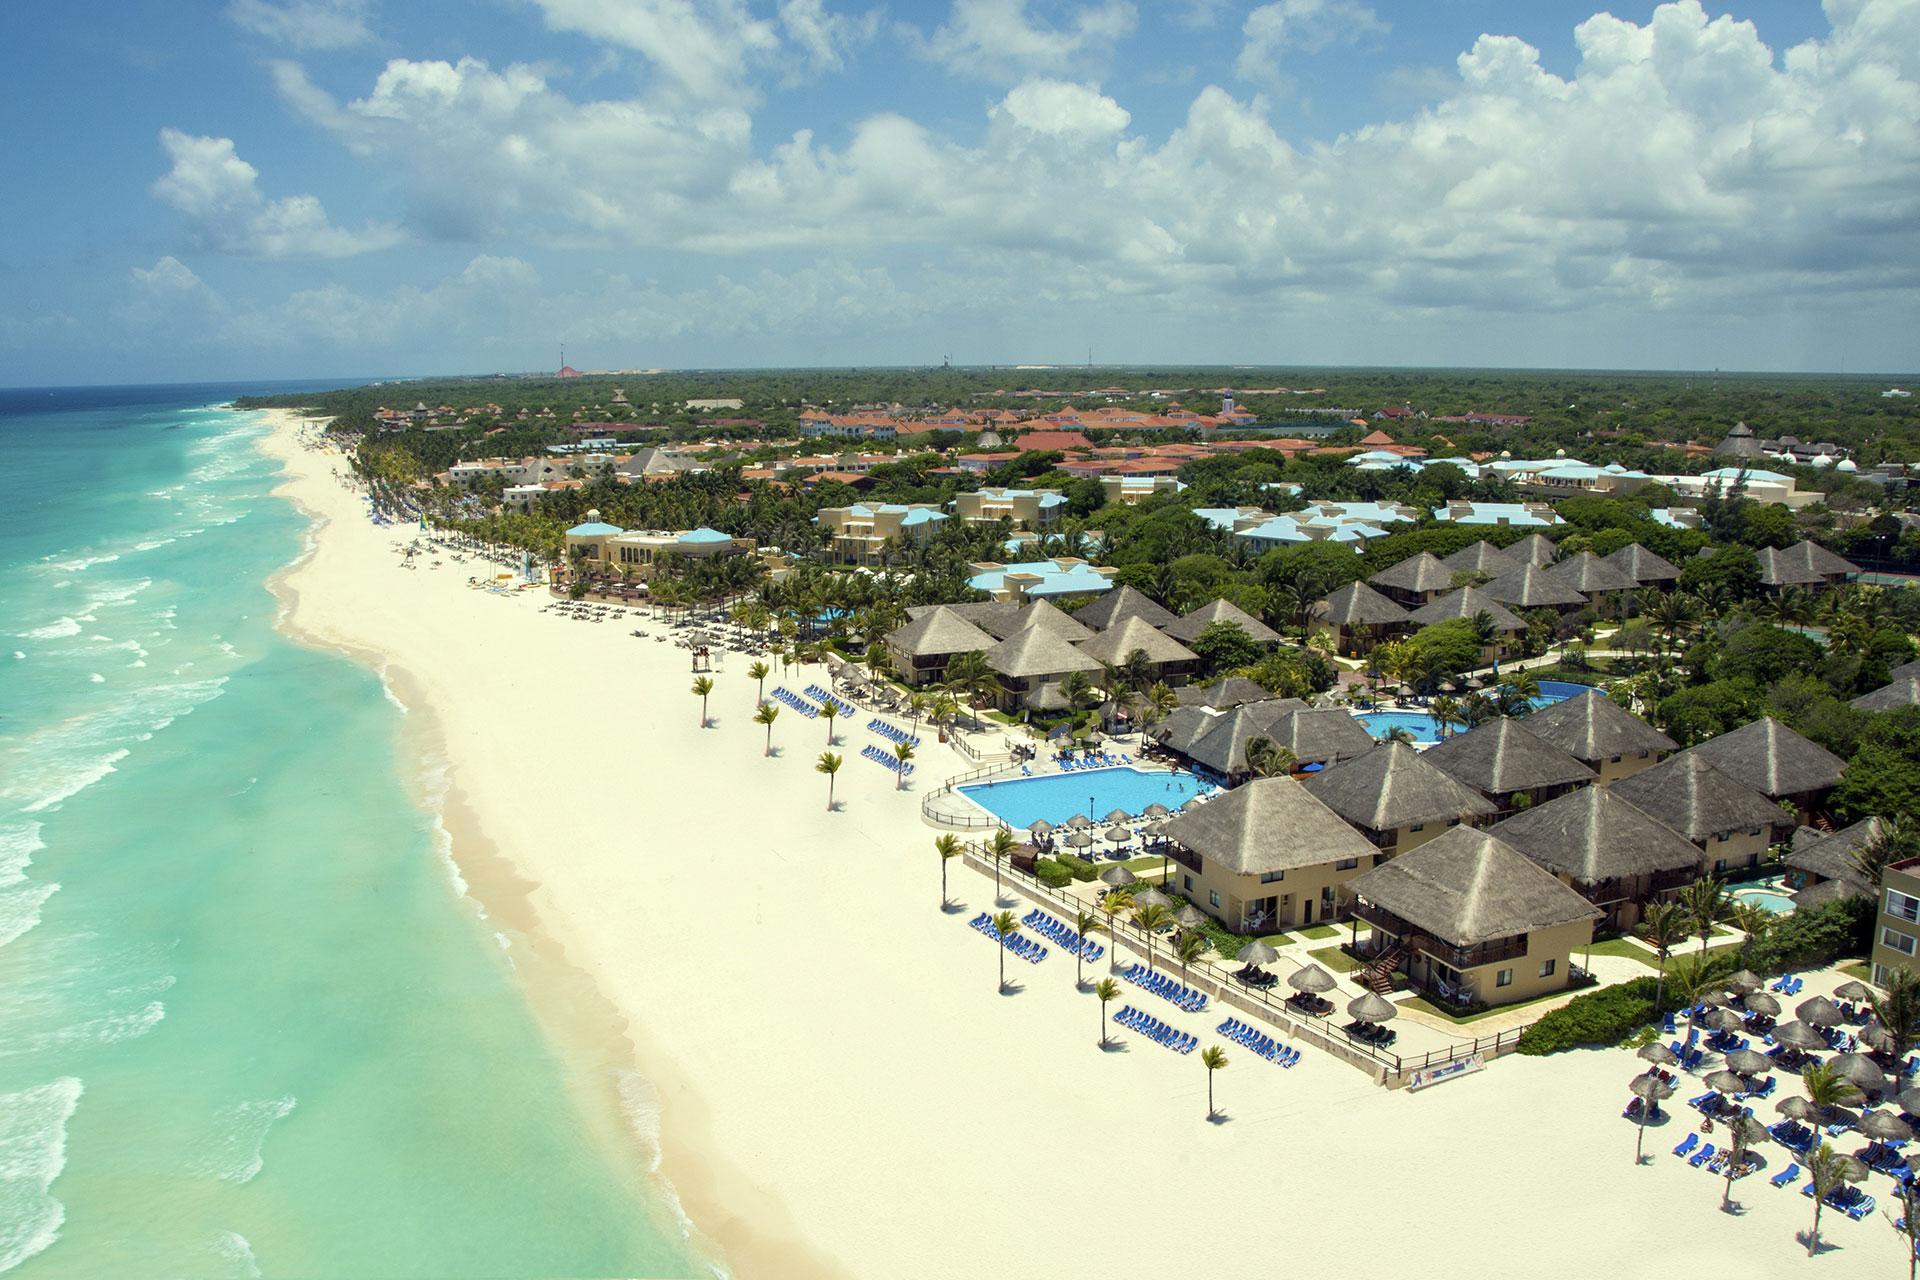 Aerial View of Allegro Playacar; Courtesy of Allegro Playacar